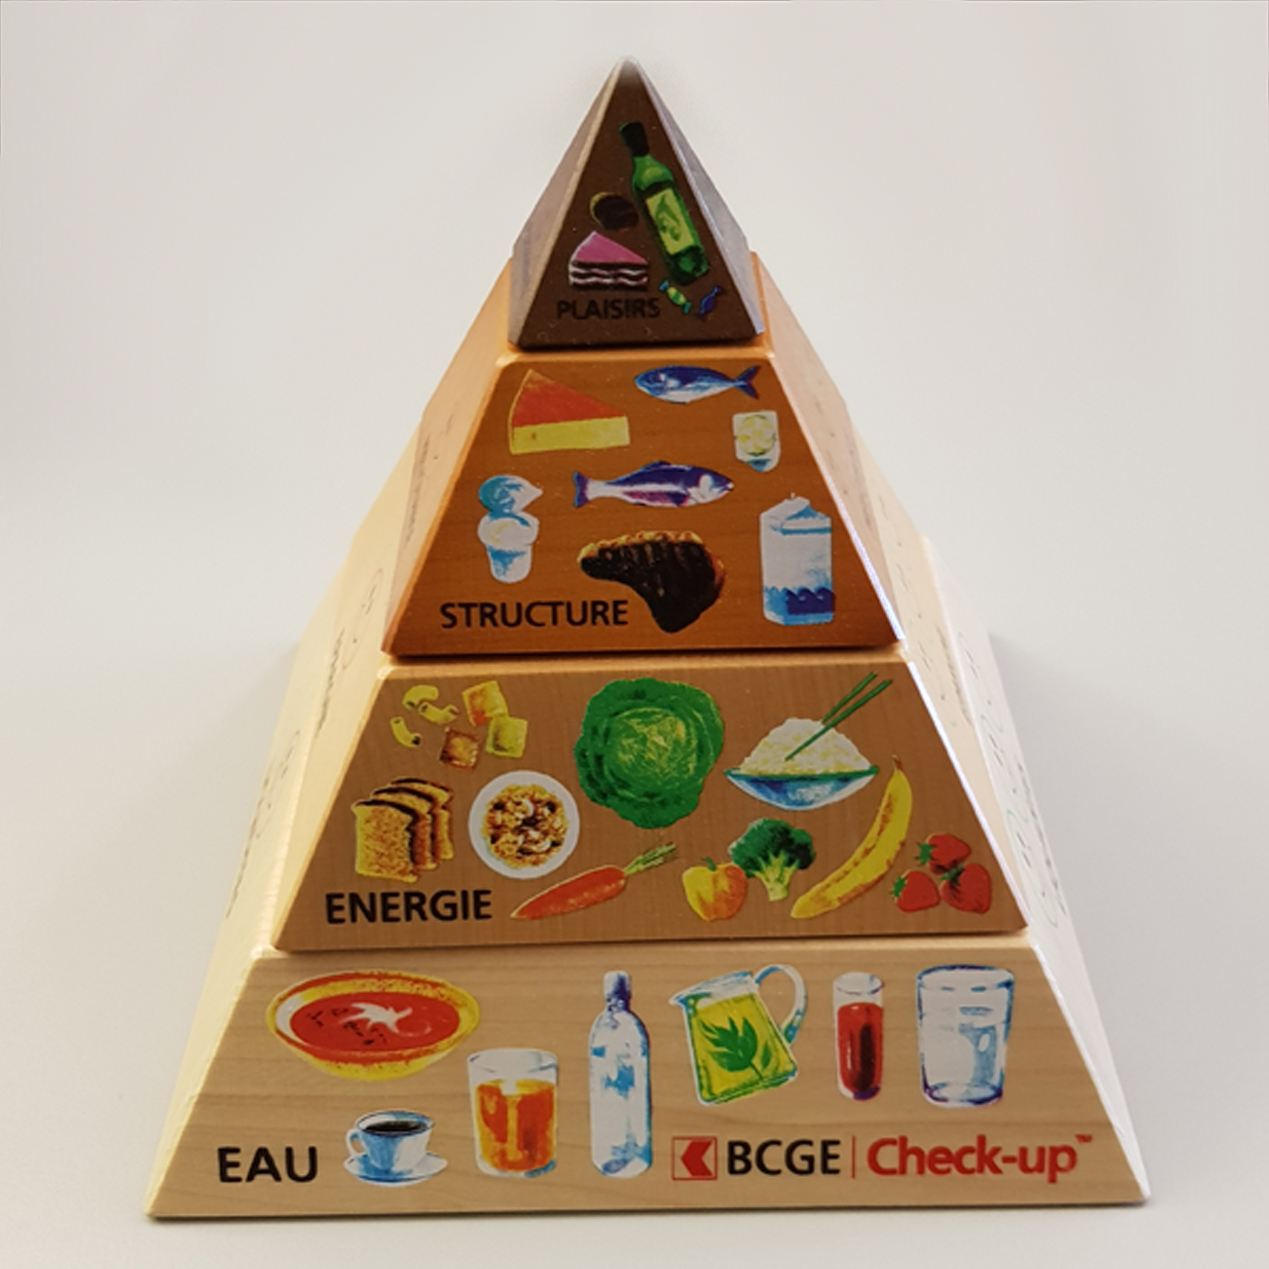 pyramide check-up